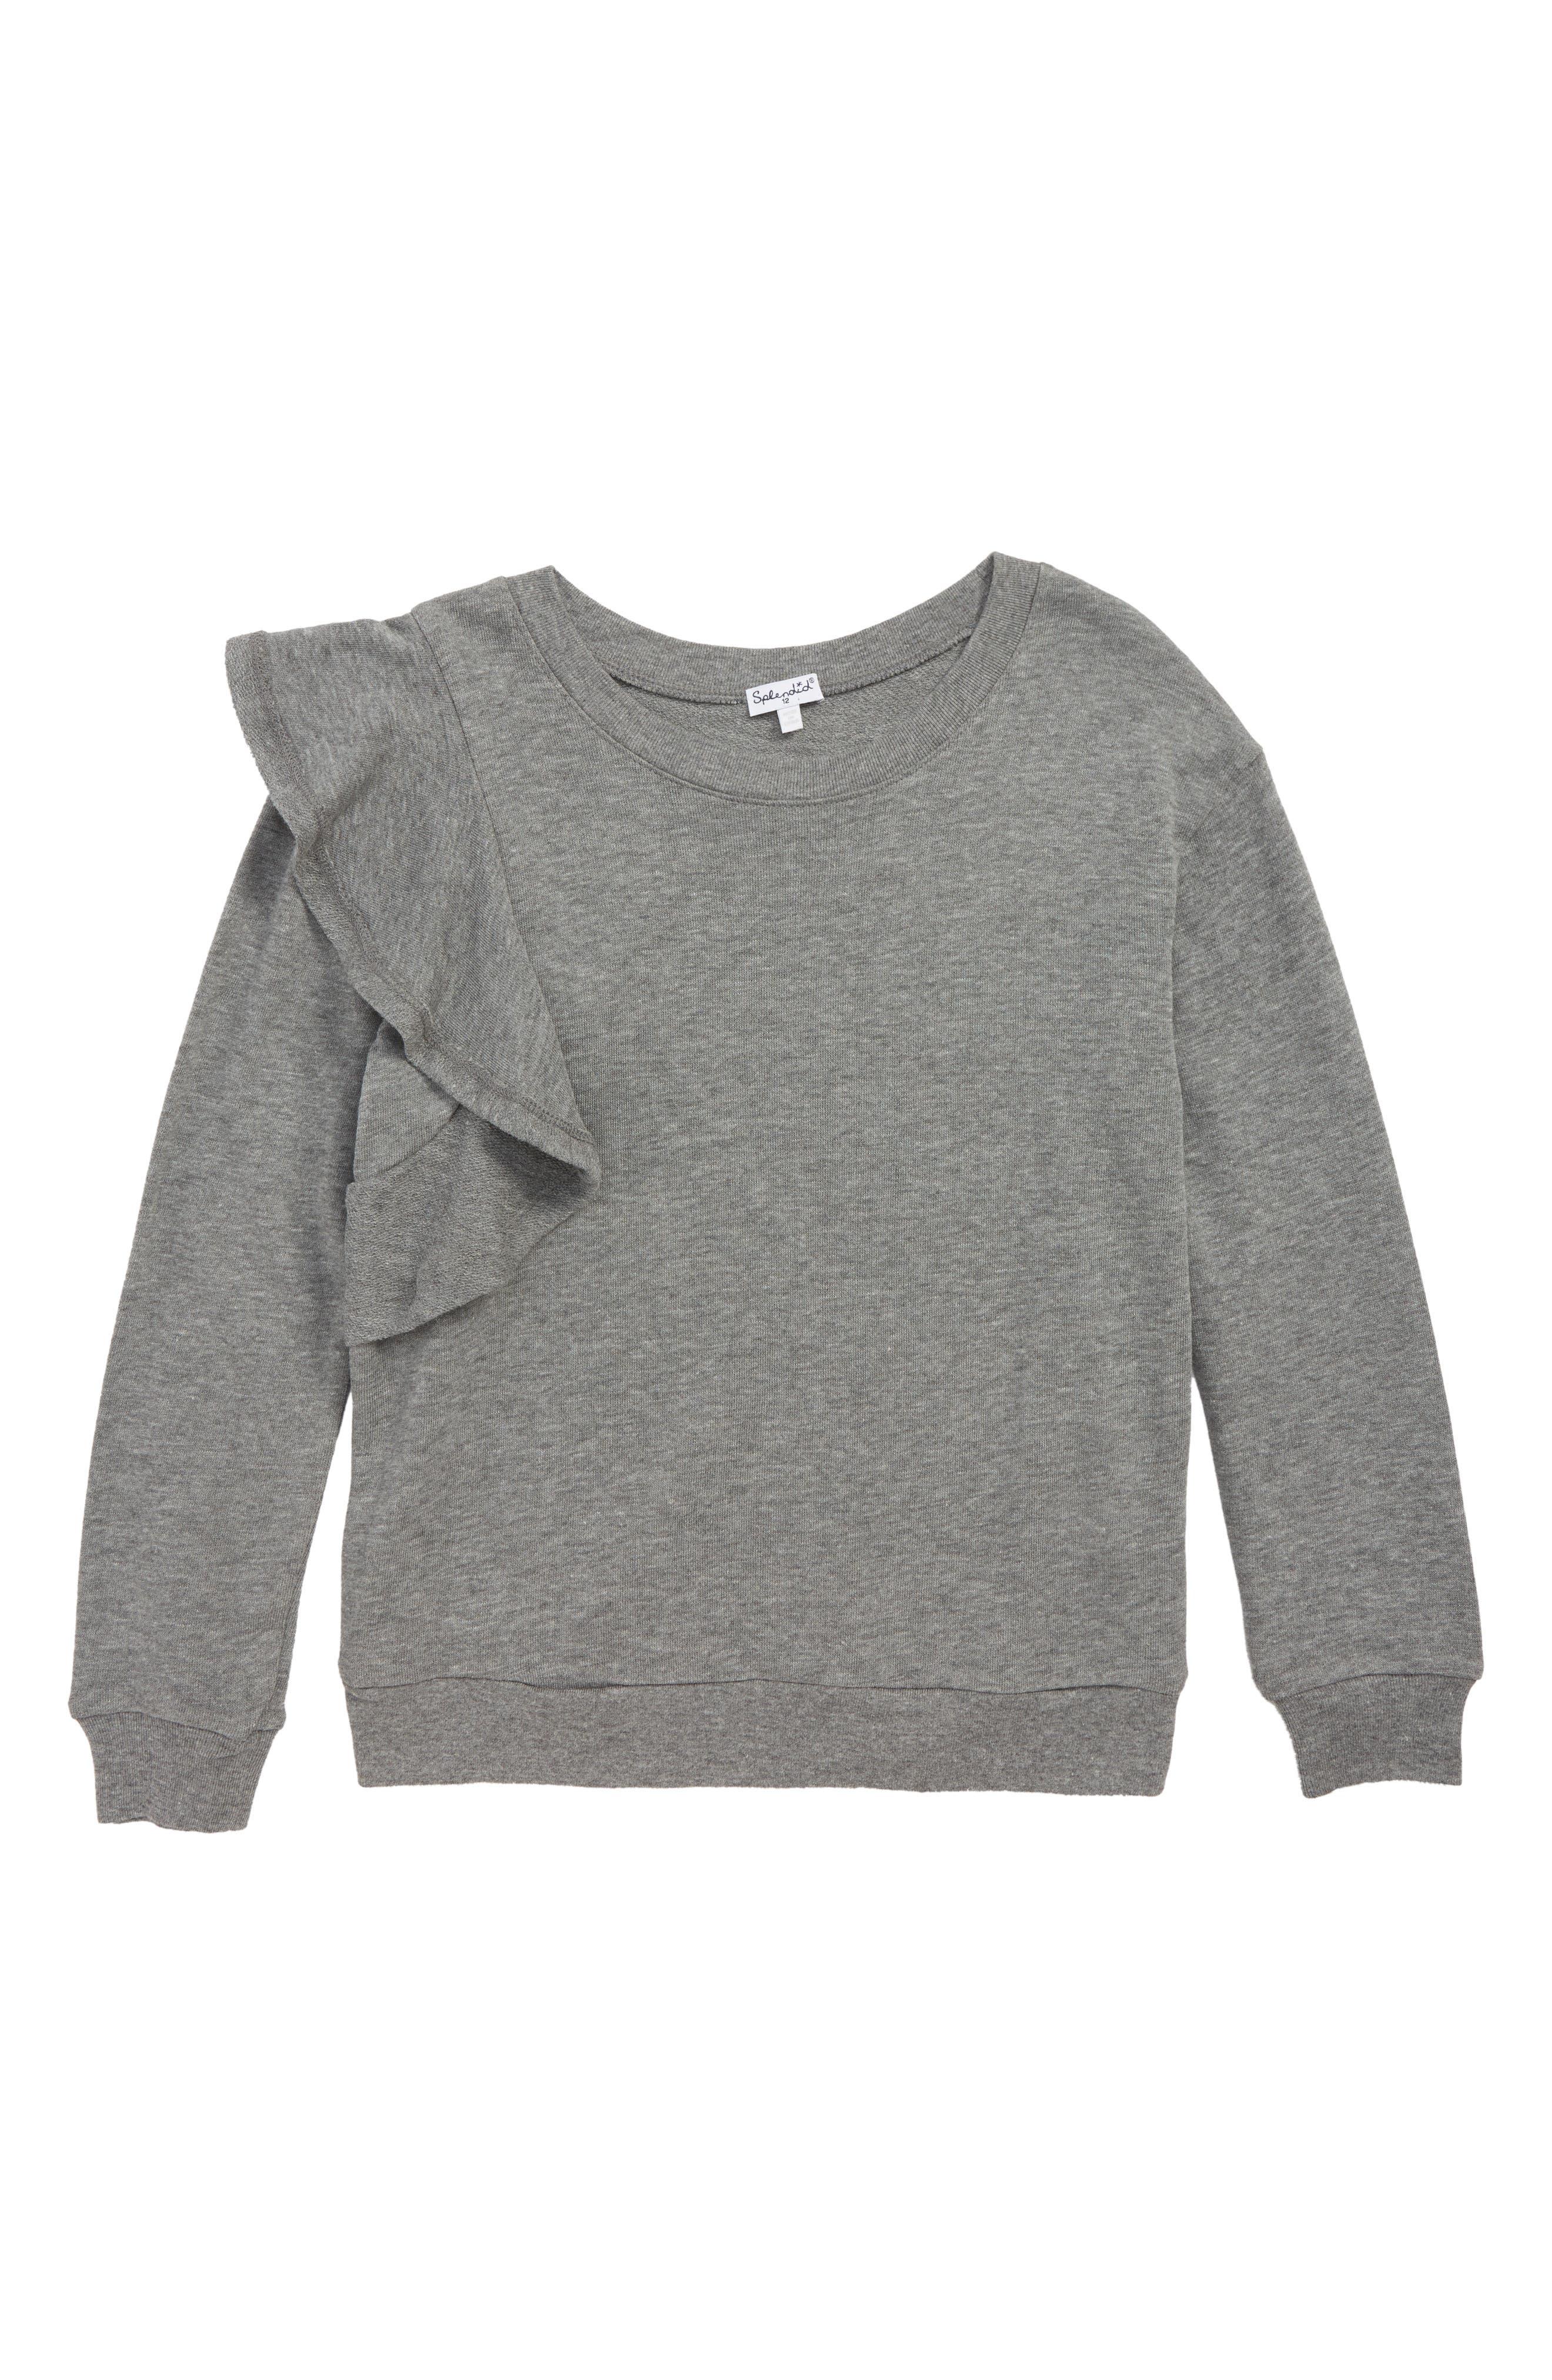 Ruffle Sweatshirt,                             Main thumbnail 1, color,                             020